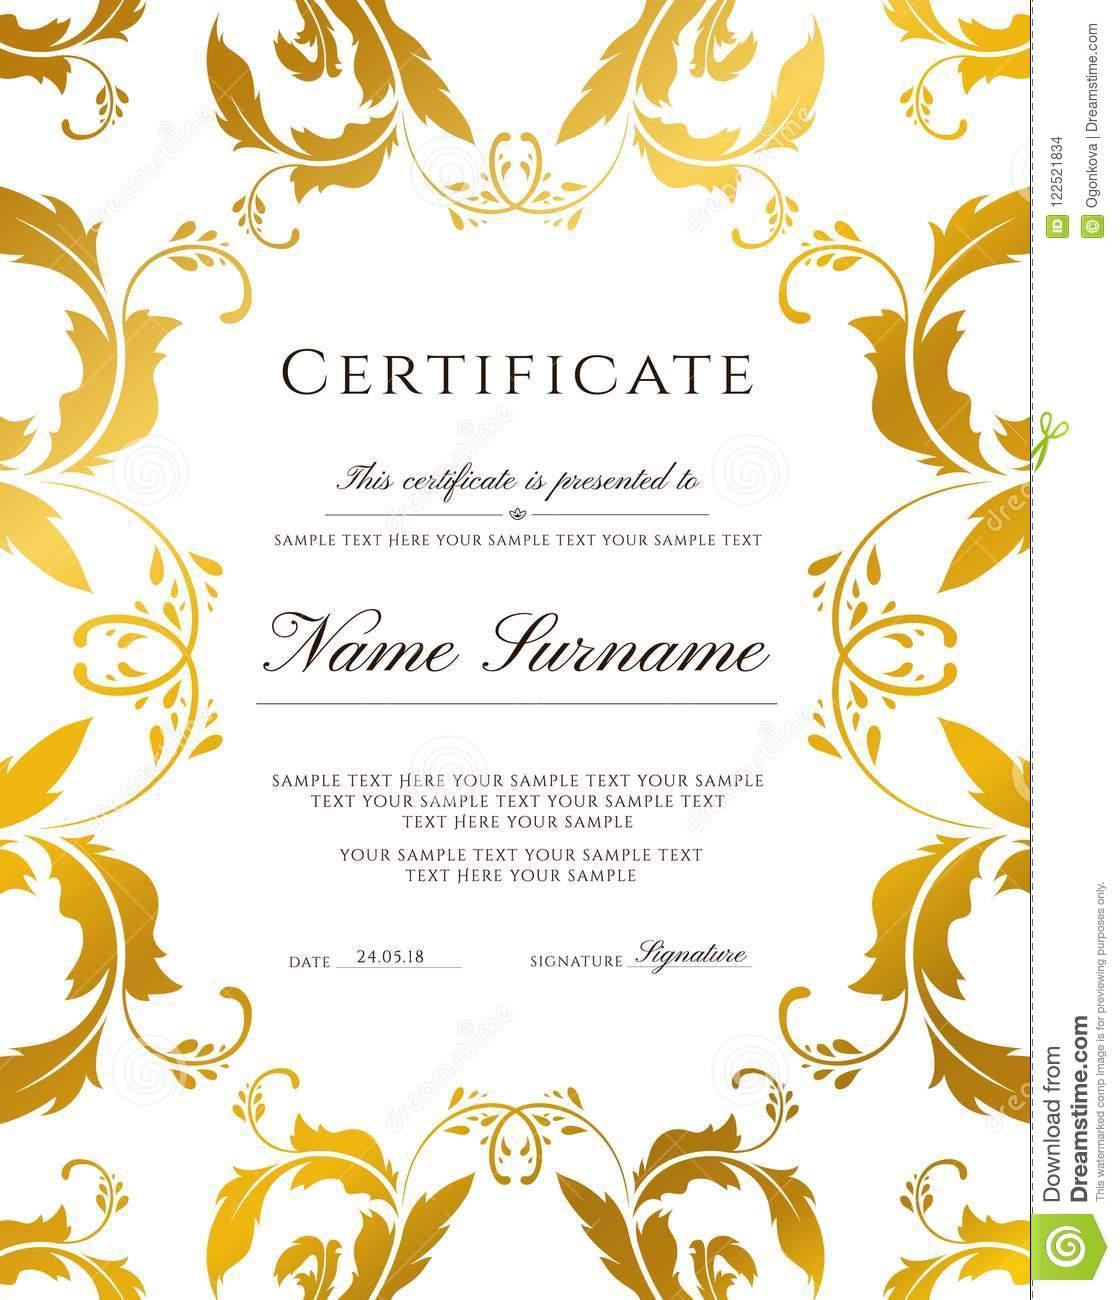 Template Certificate Of Appreciation Border Design